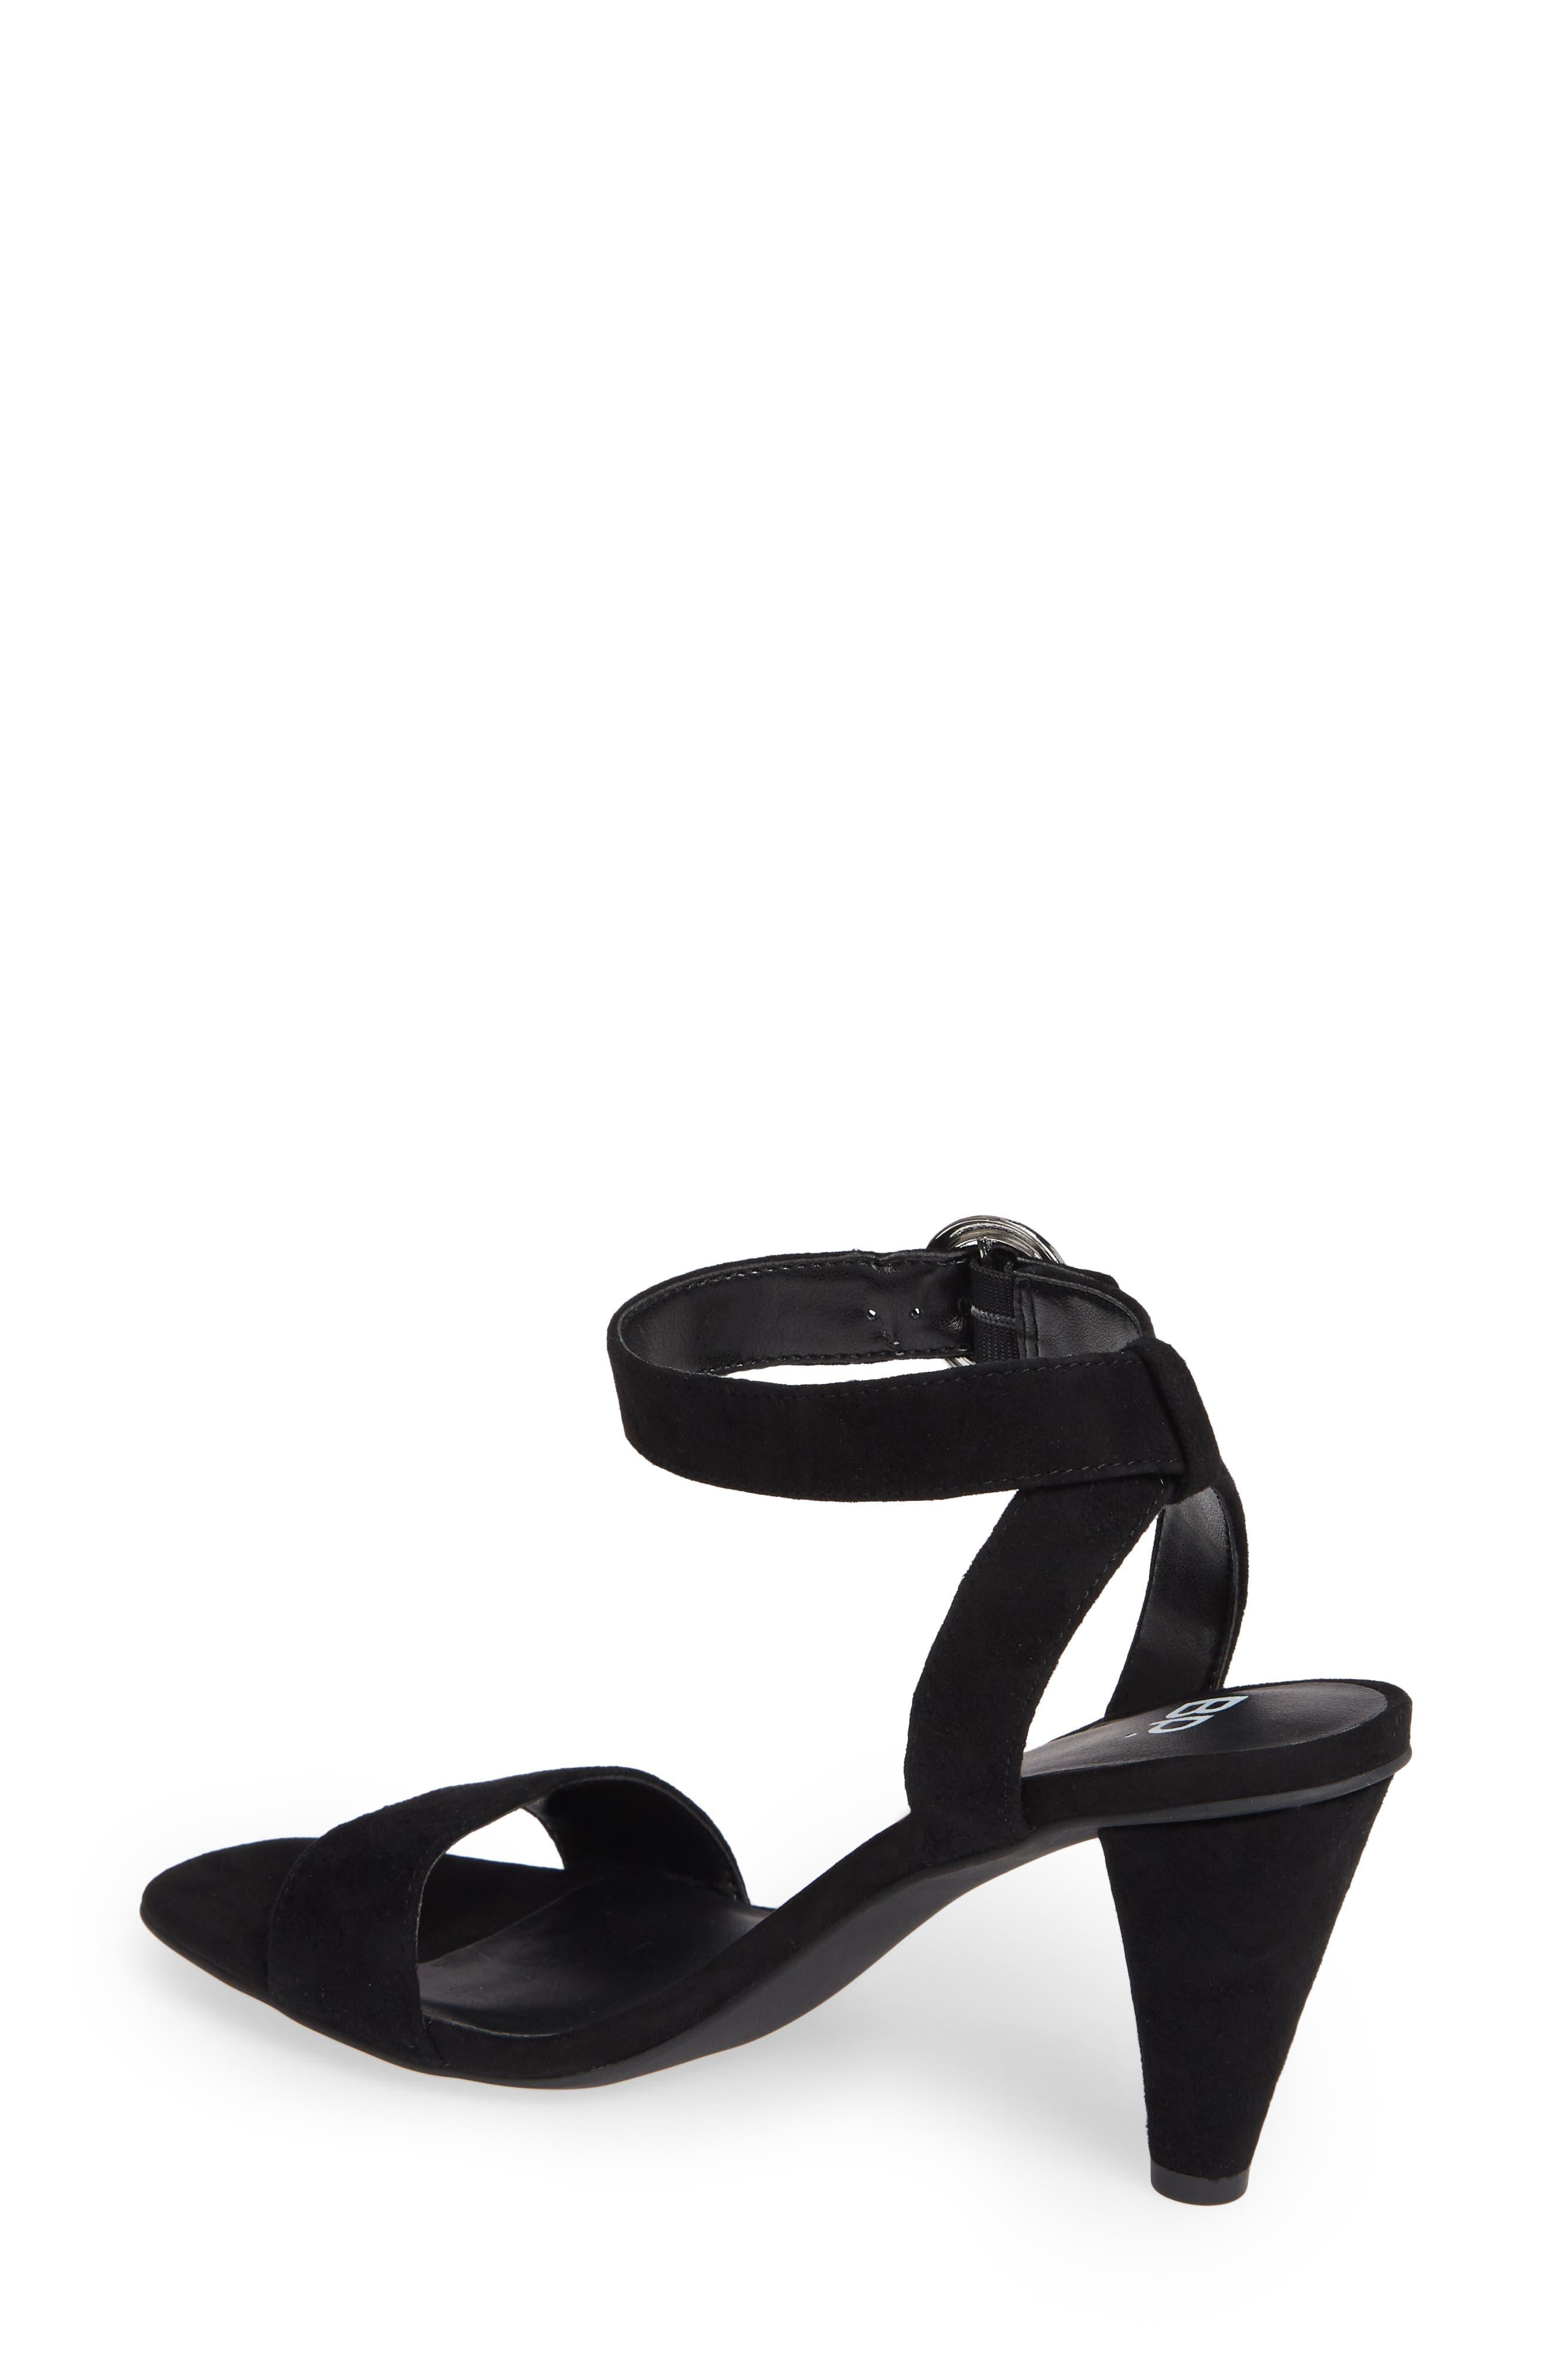 Cleo Cone Heel Sandal,                             Alternate thumbnail 2, color,                             BLACK SUEDE